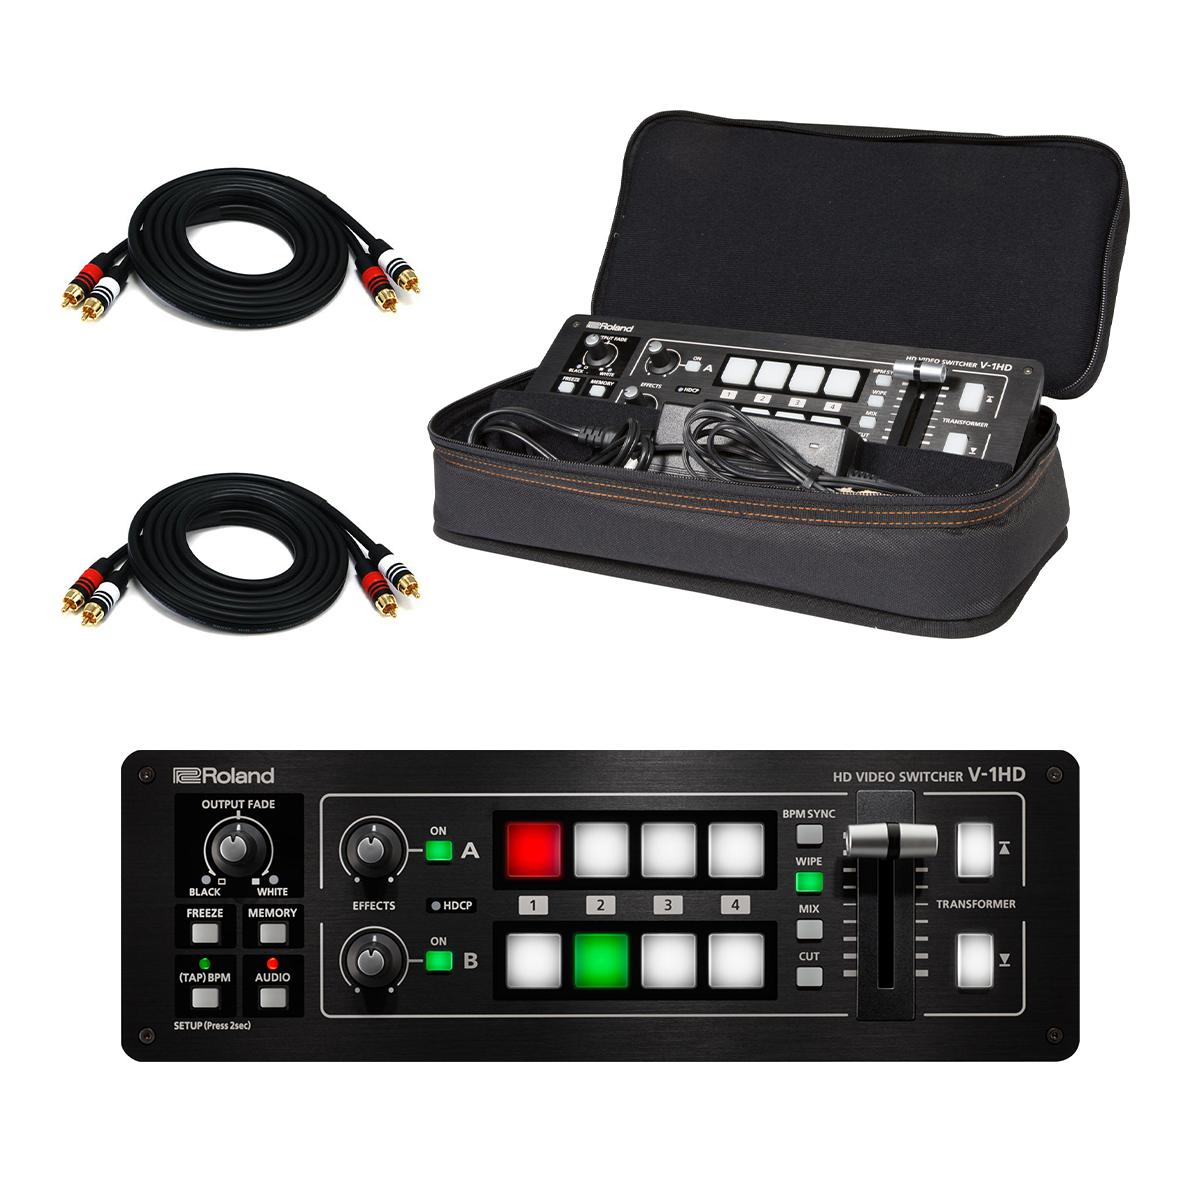 -4 Roland V-1HD Portable 4 x HDMI Input Switcher - Roland CB-BV1 Bag - (2) RCA Cables - $995.00